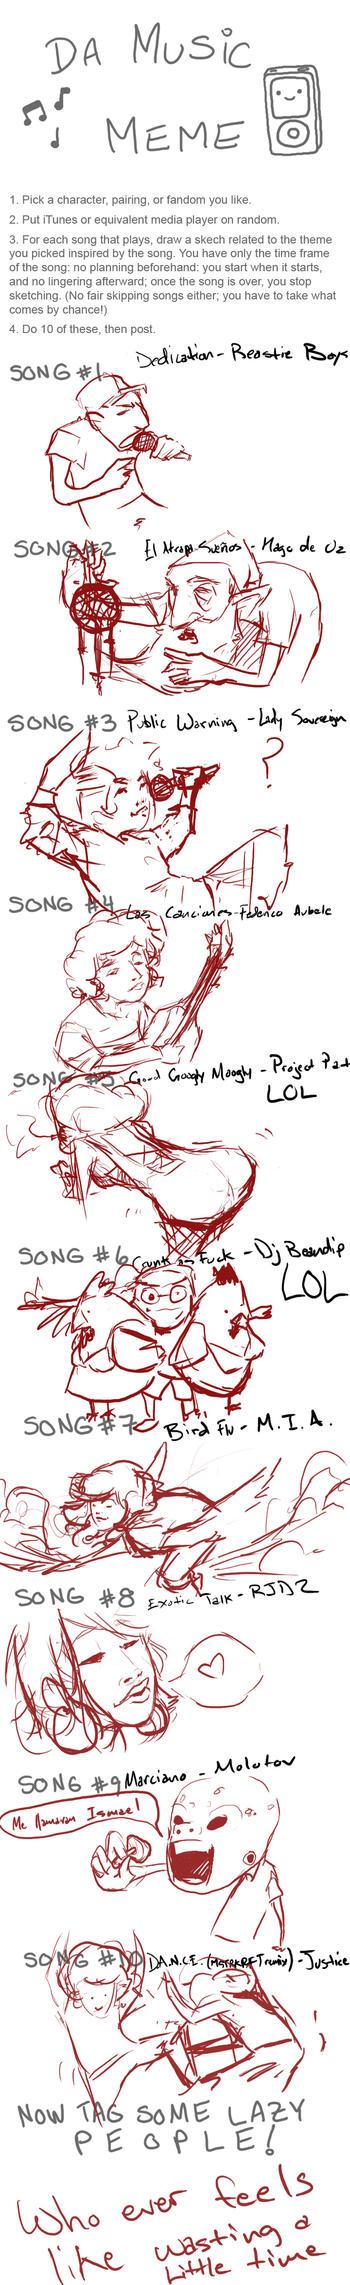 DA music meme by padayappa